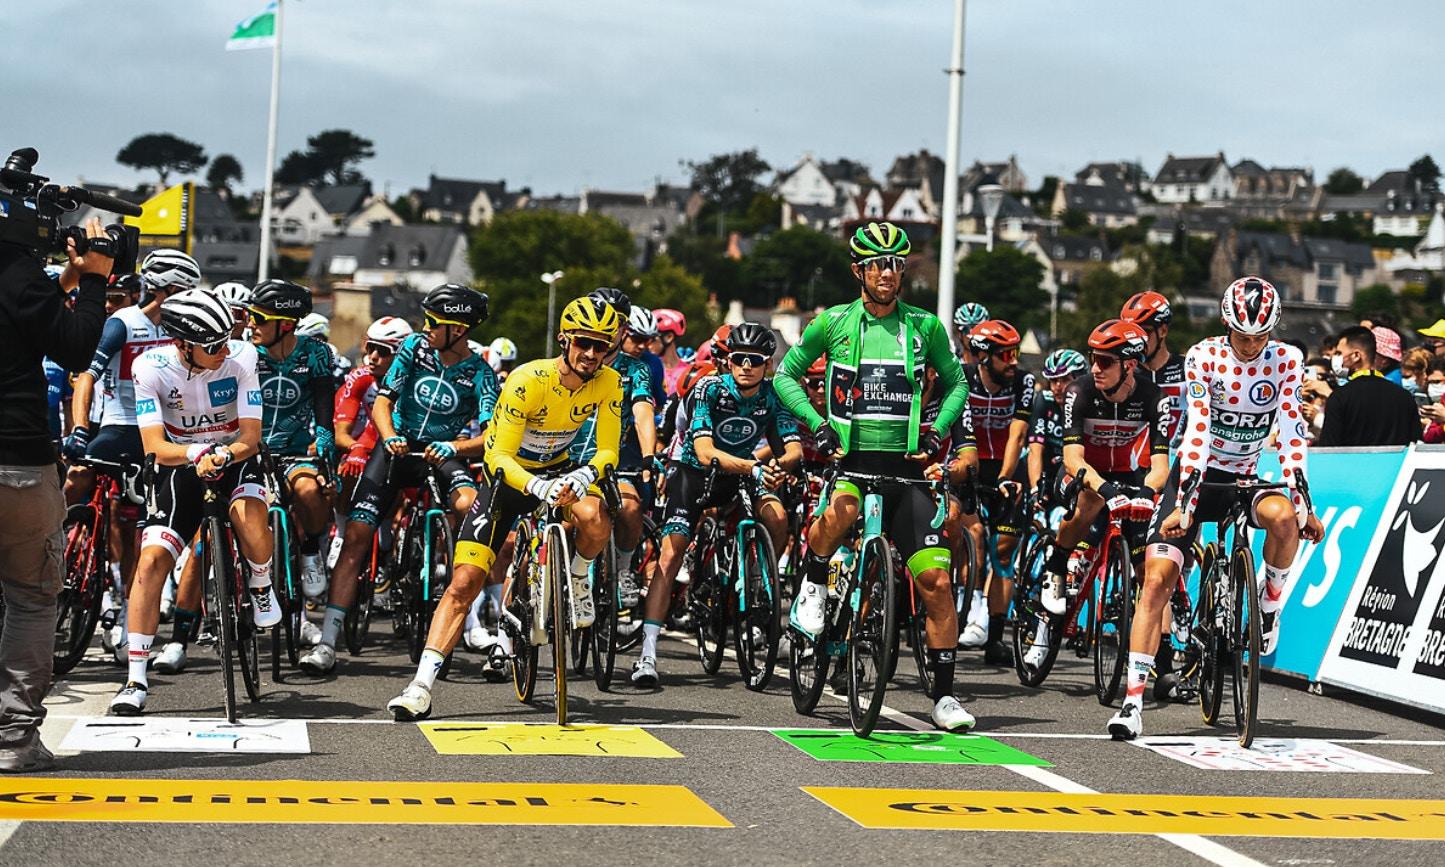 Tour de France 2021: samenvatting van de tweede etappe